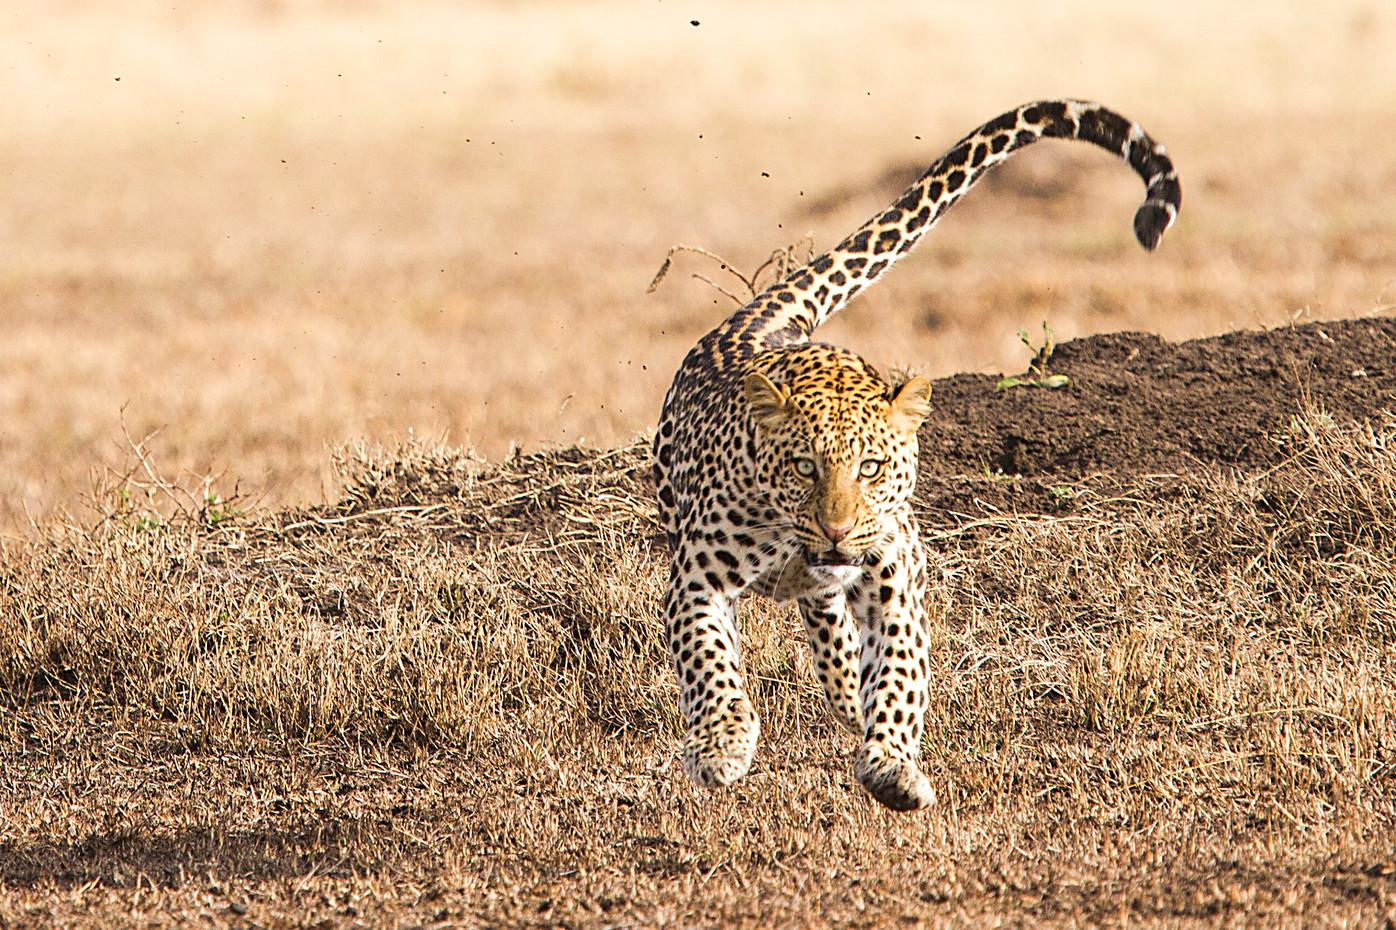 Charging leopard in Grumeti Reserve, Tanzania